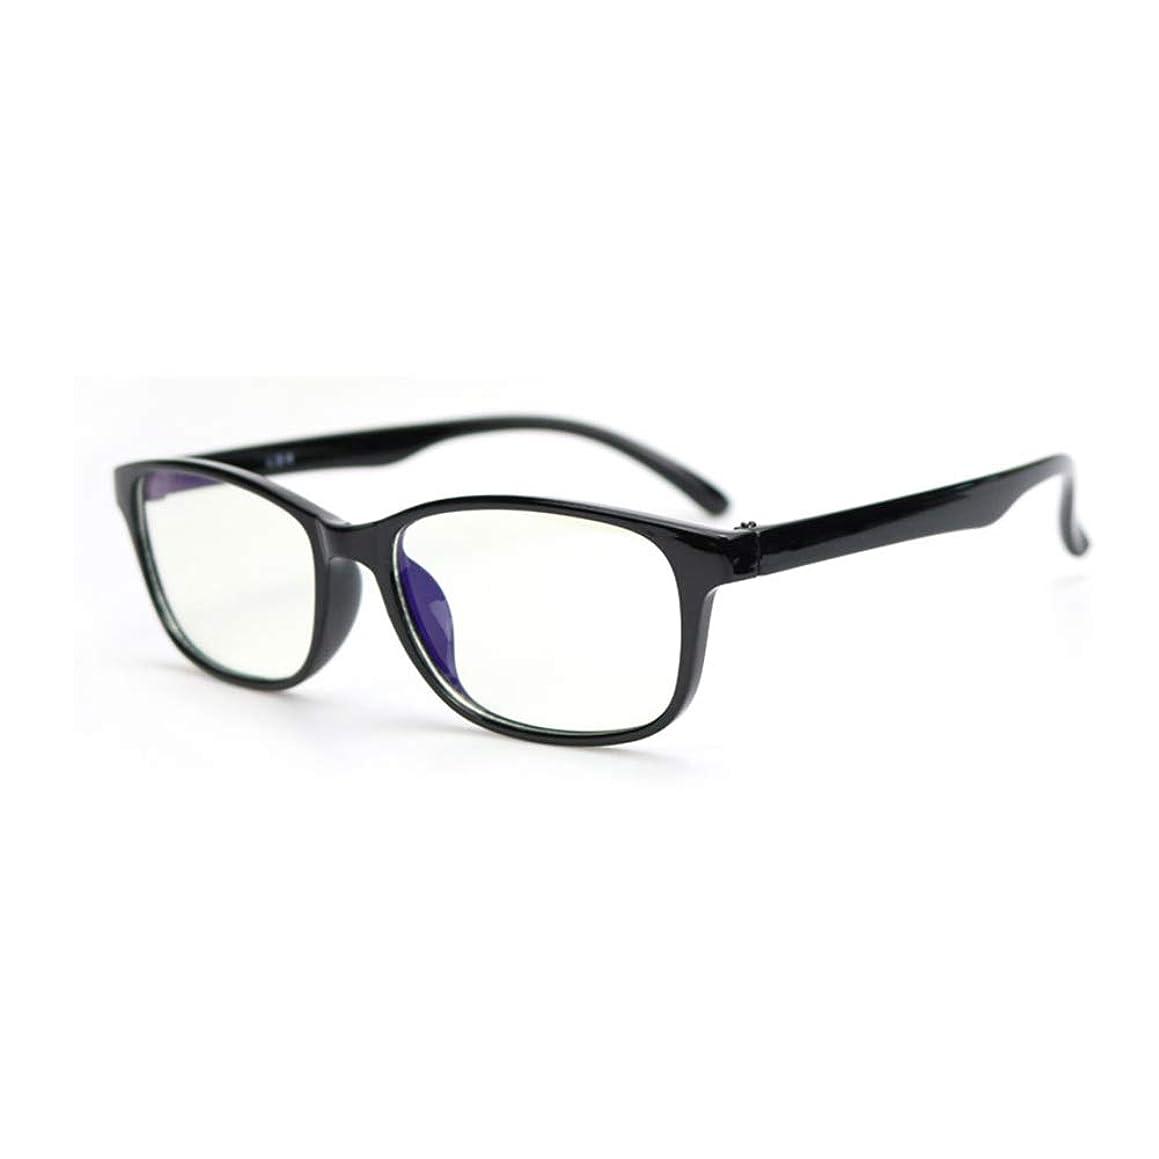 Graphene Anion Quantum Anti-Blue Glasses, Lightweight Retro 100% UV Blocking Goggles